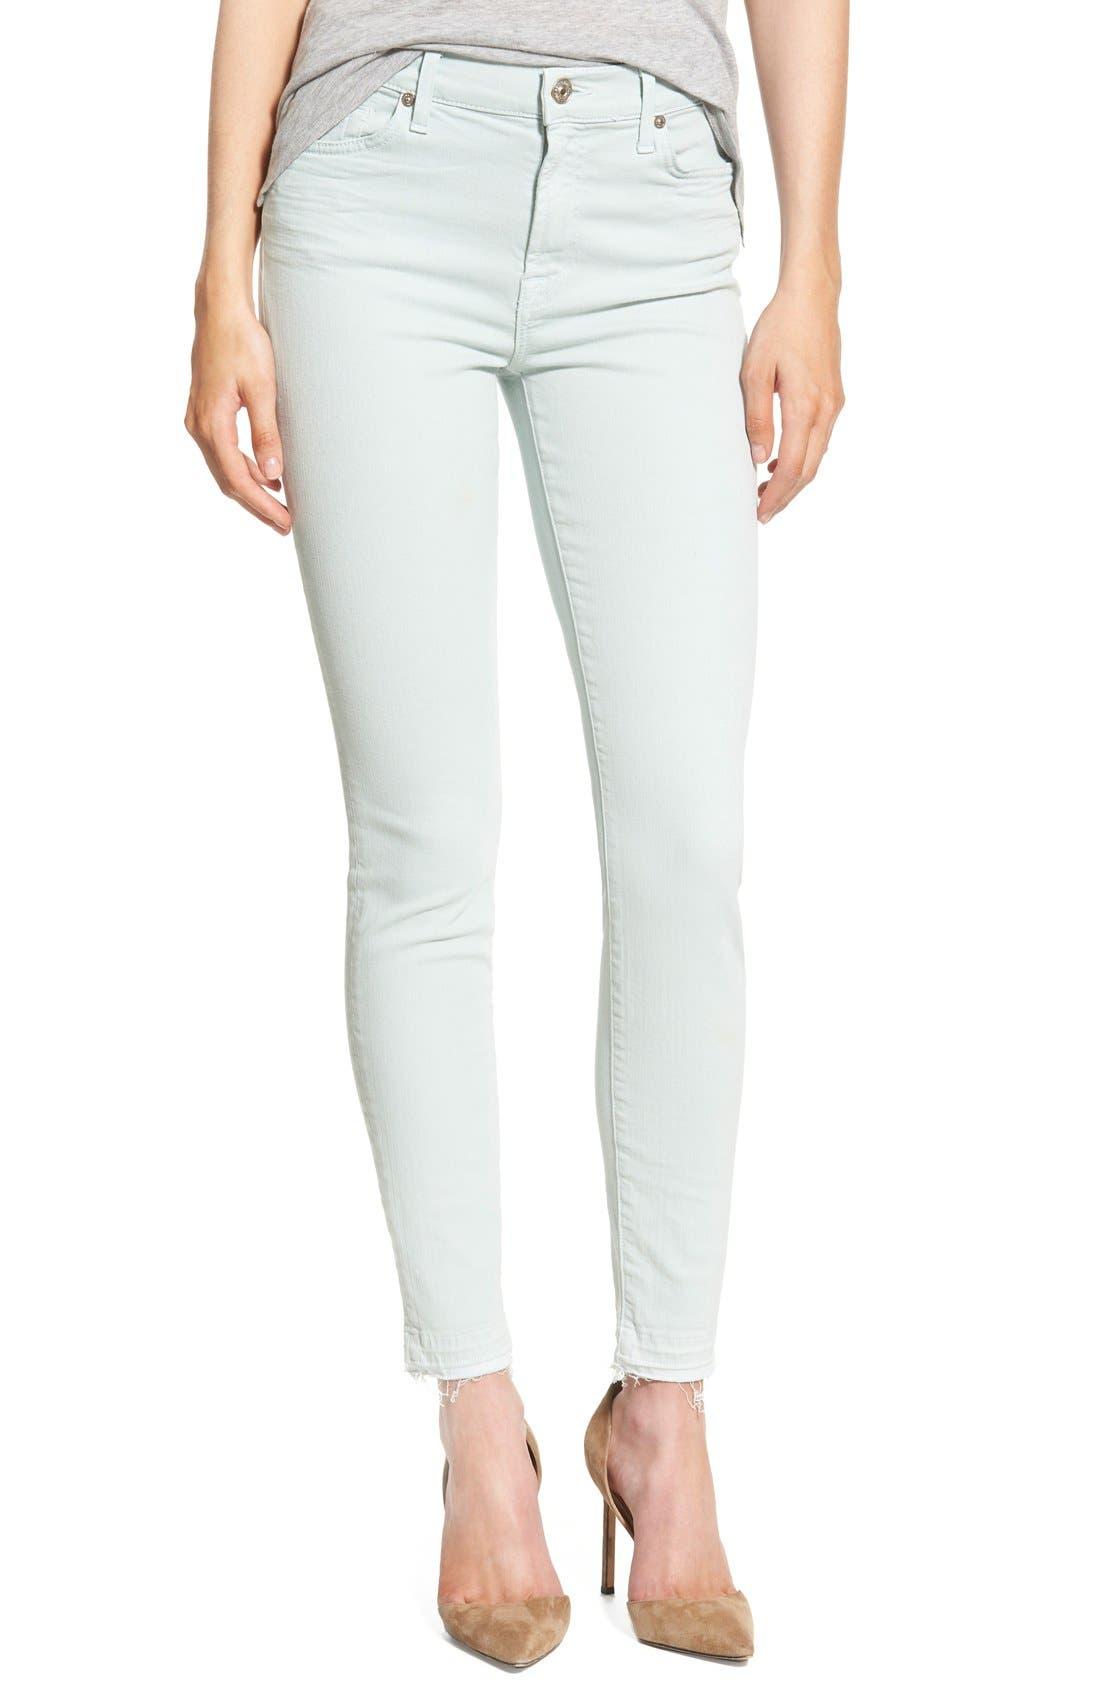 Alternate Image 1 Selected - 7 For All Mankind® Released Hem Ankle Skinny Jeans